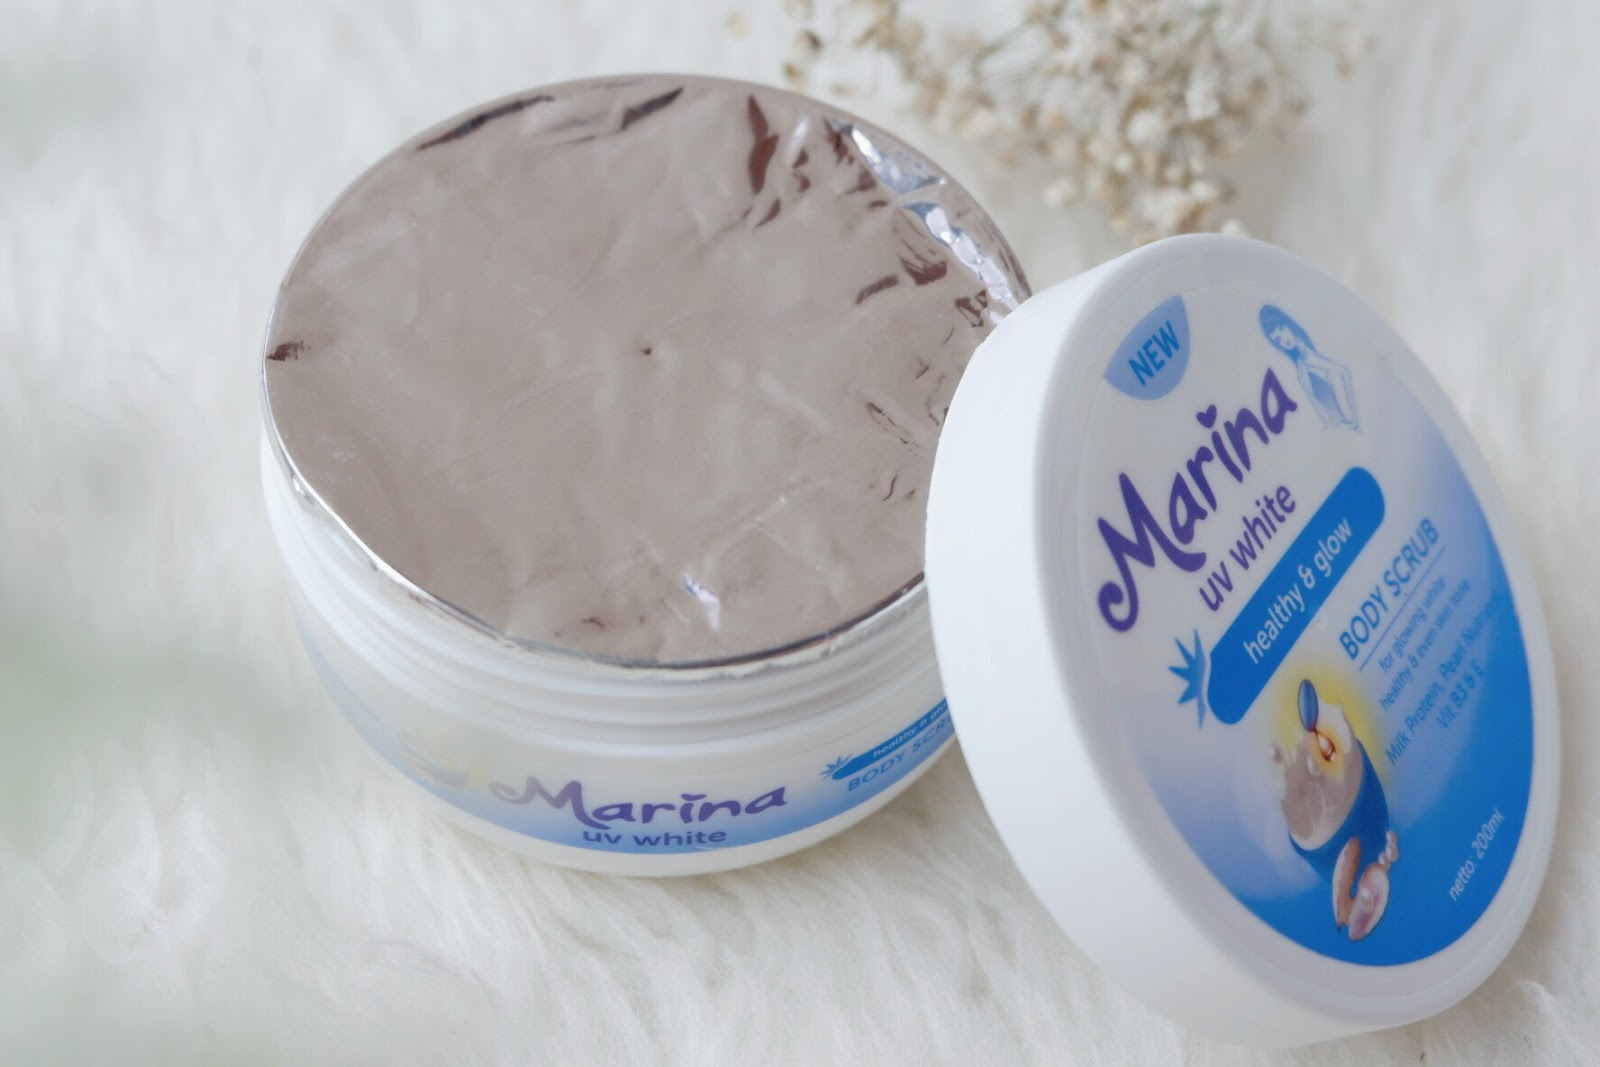 Beauty Diary Kania Review Marina Uv White Healthy Glow Dua Body Scrub 200ml Adalah Butiran Yang Lembut Dan Mampu Mengangkat Kotoran Serta Sel Kulit Mati Diformulasikan Khusus Dengan